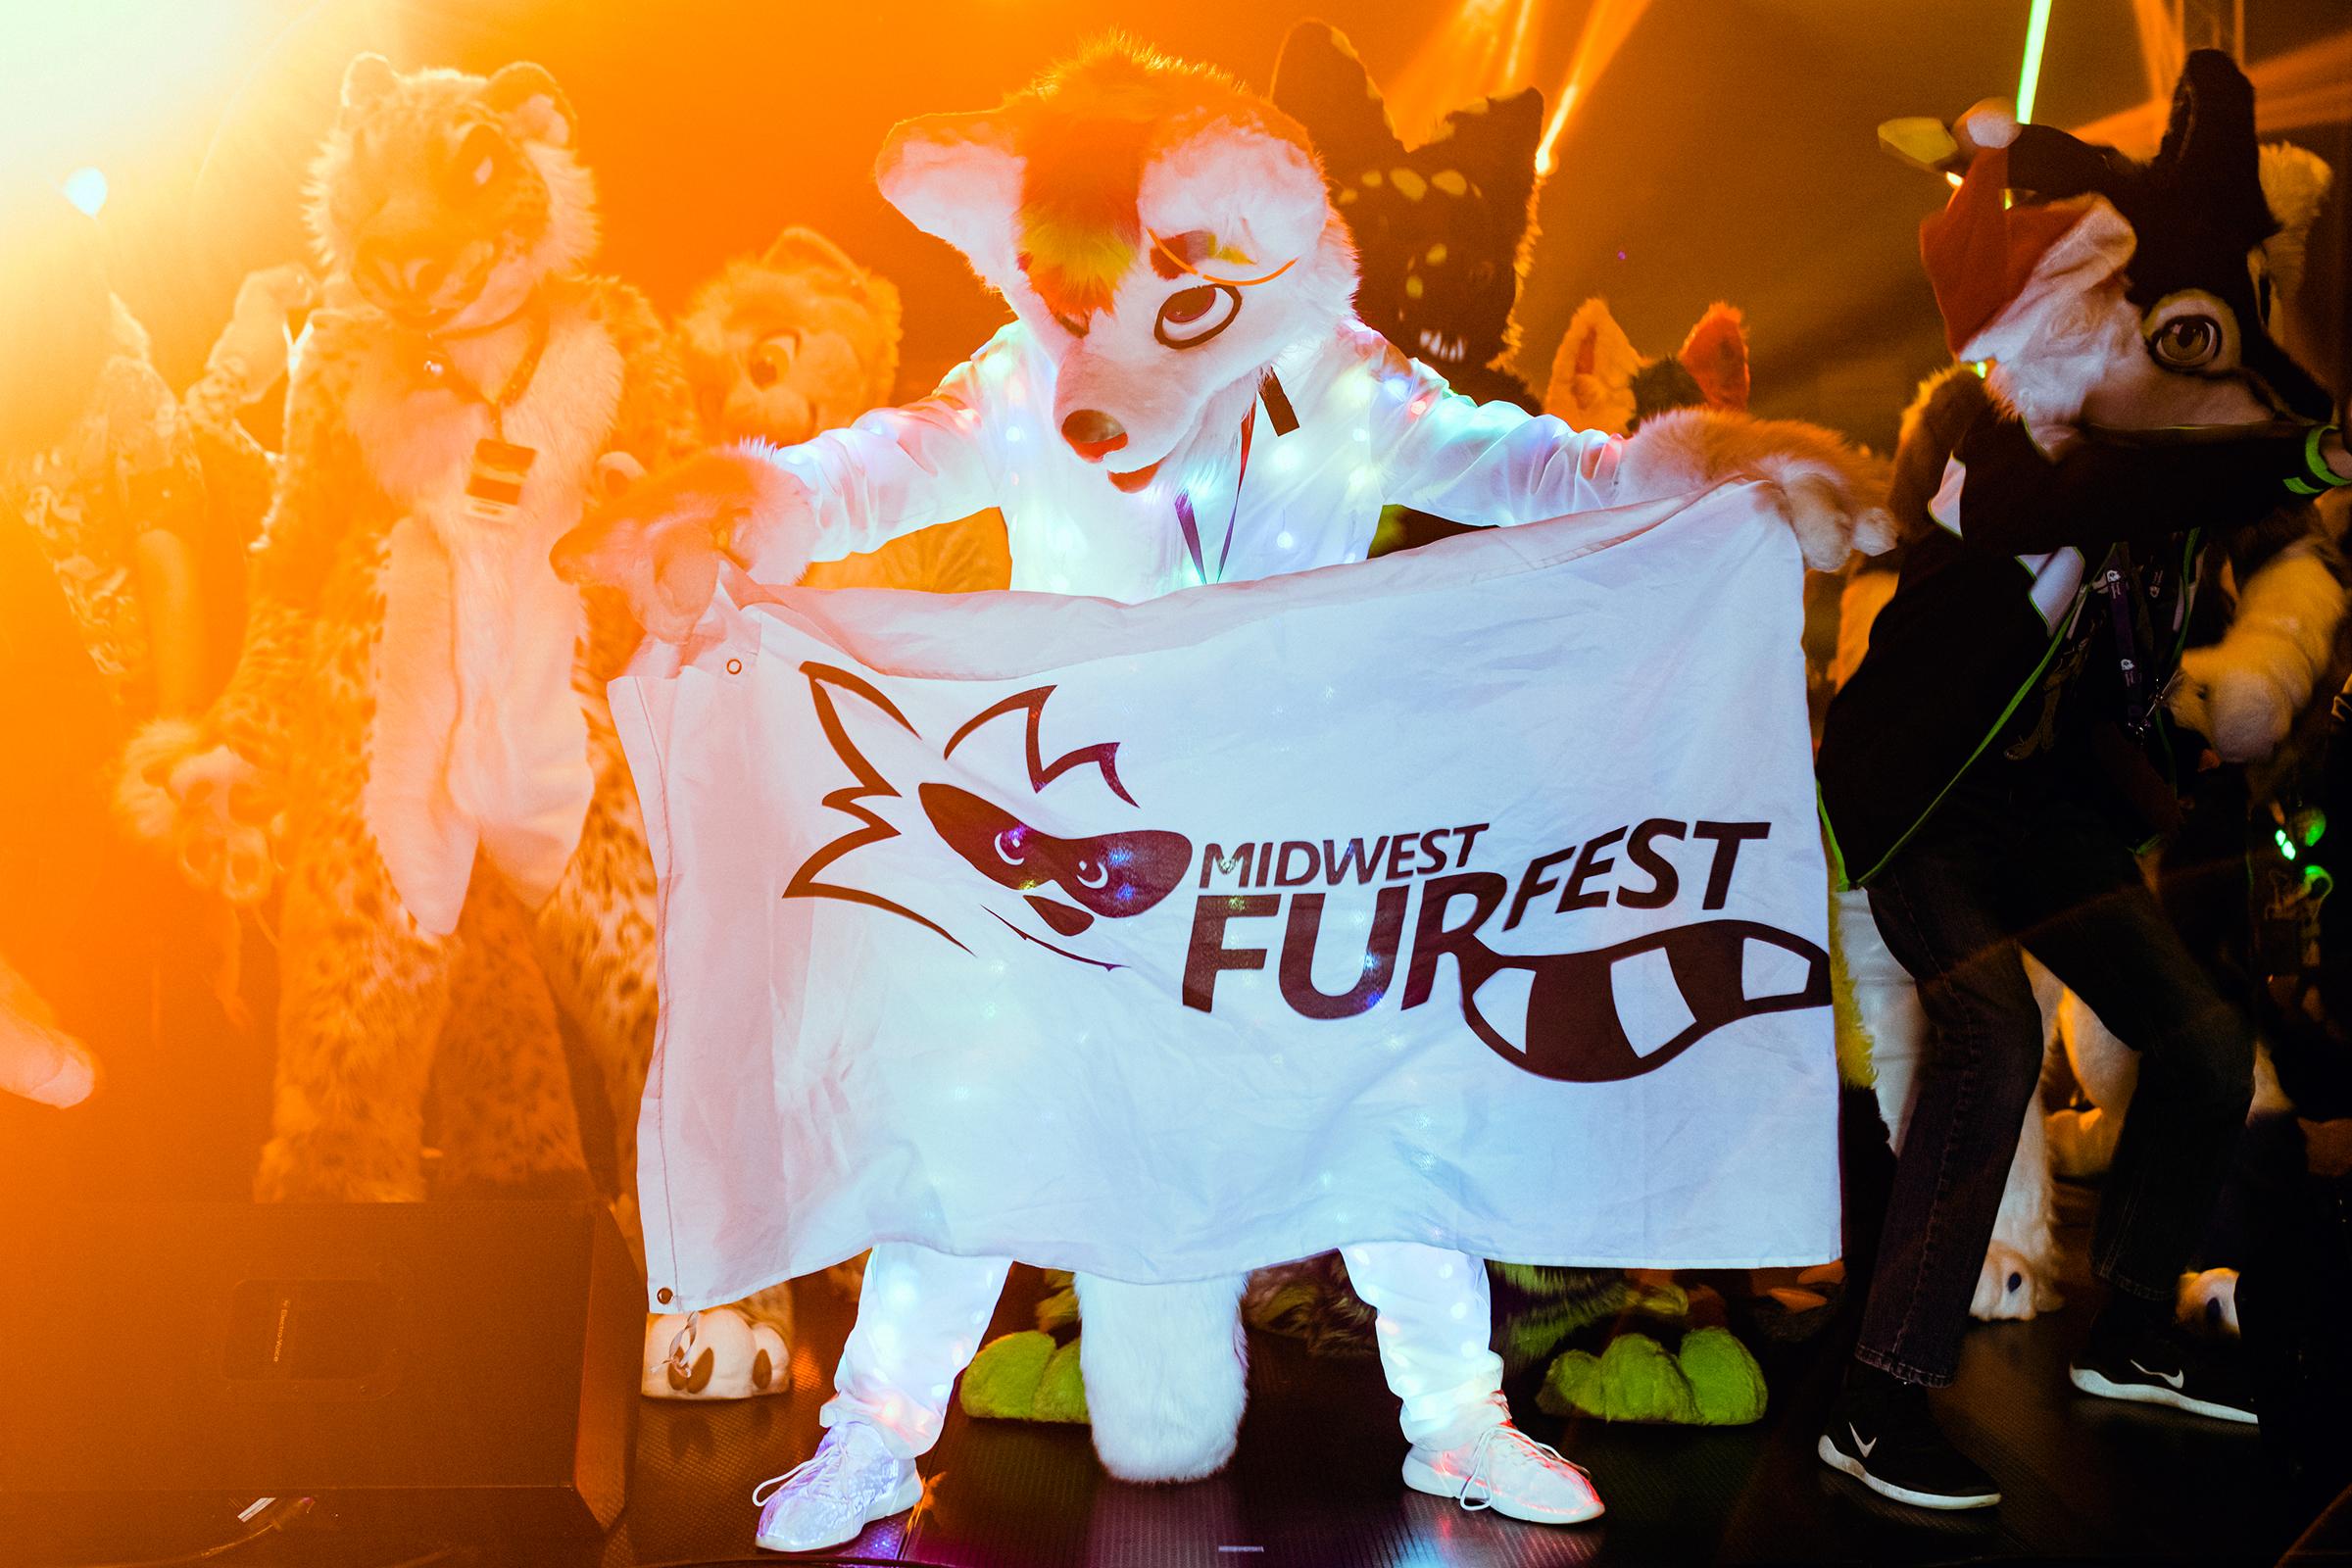 December 4th, 2019 - Rosemont, IL - Midwest Furr Fest at Donald E. Stephens Convention Center. Furrfest dance party at Midwest Furr Fest